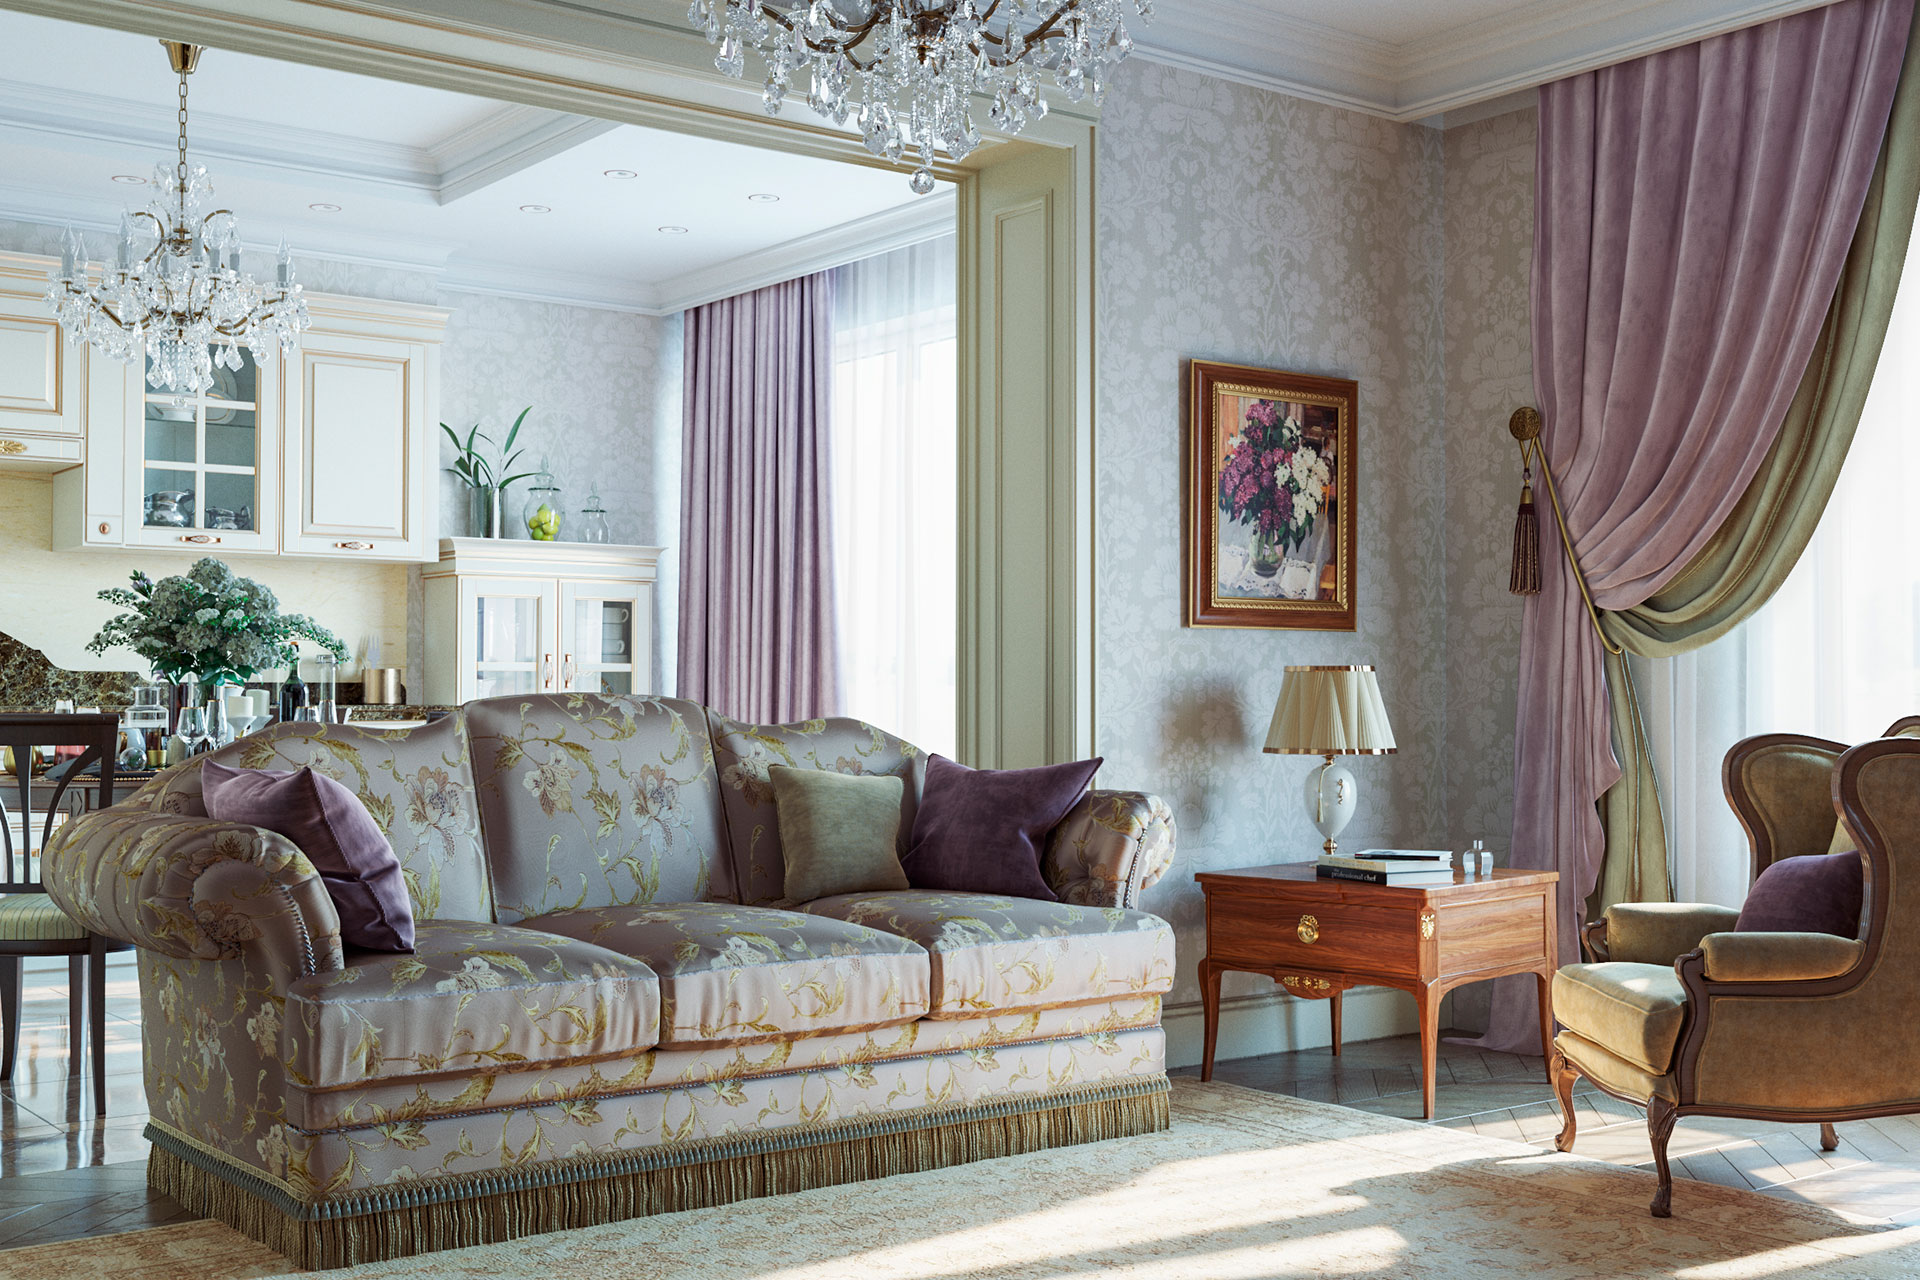 3D-визуализация квартиры в классическом стиле